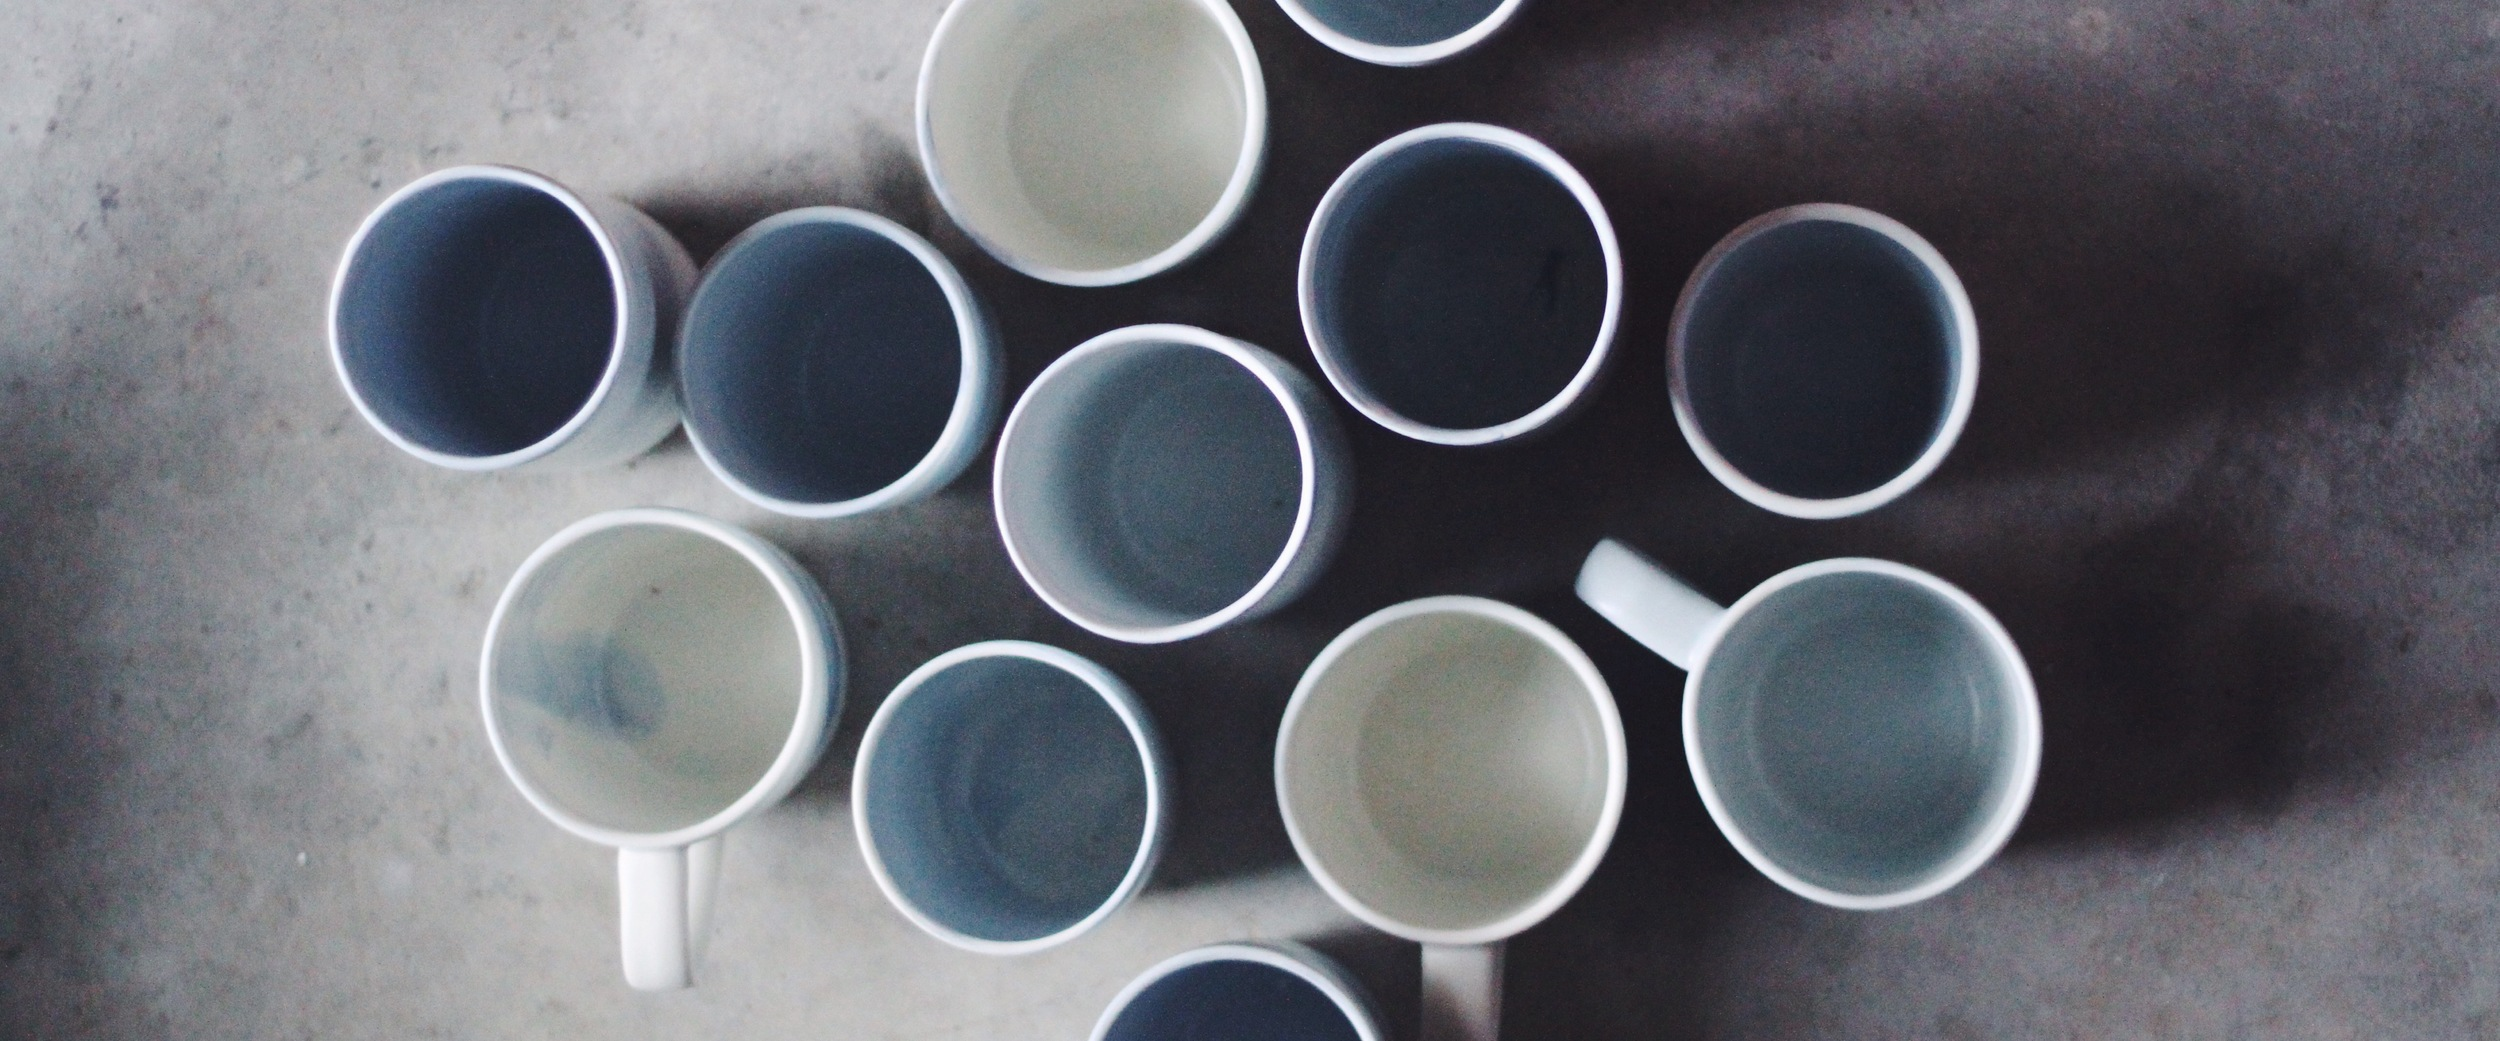 Ceramics by Jenny Rijke. Photo Credit: Jenalle Los